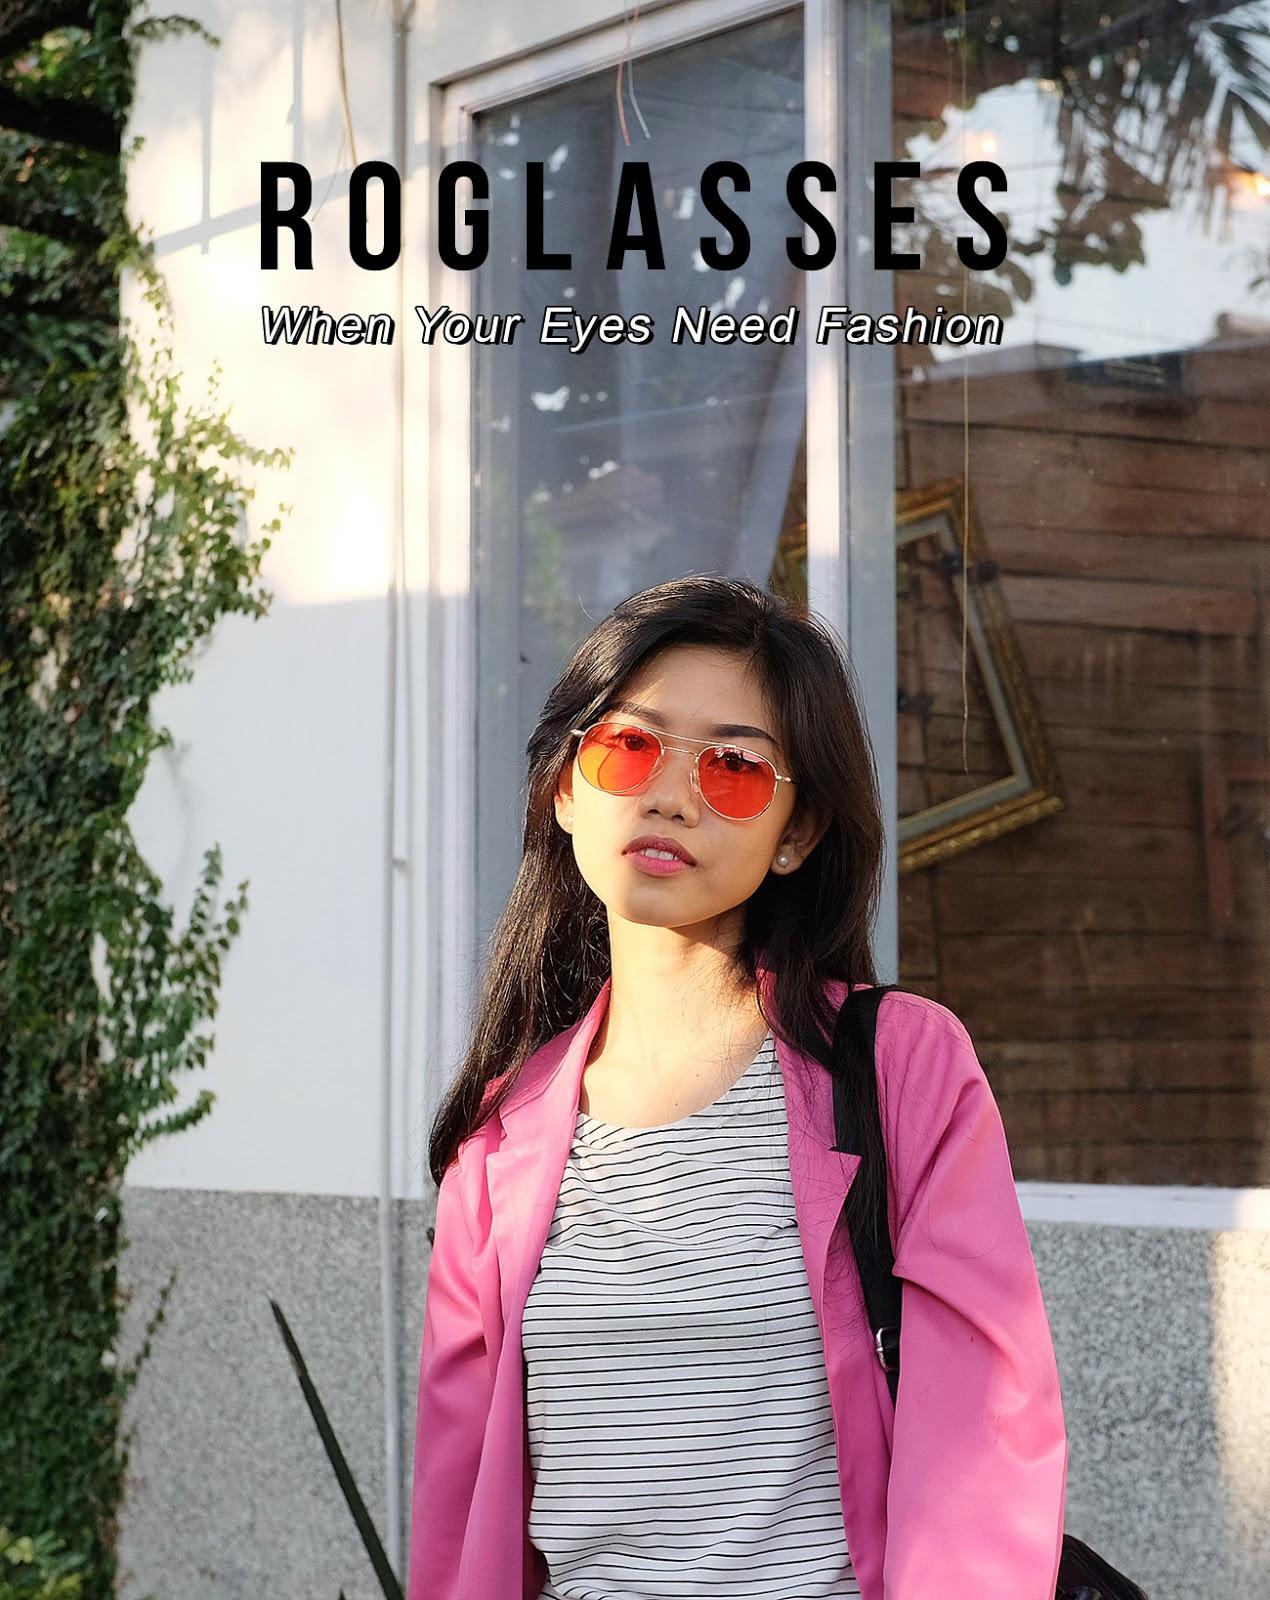 roglasses-iwearroglasses-egopro-opening-new-store